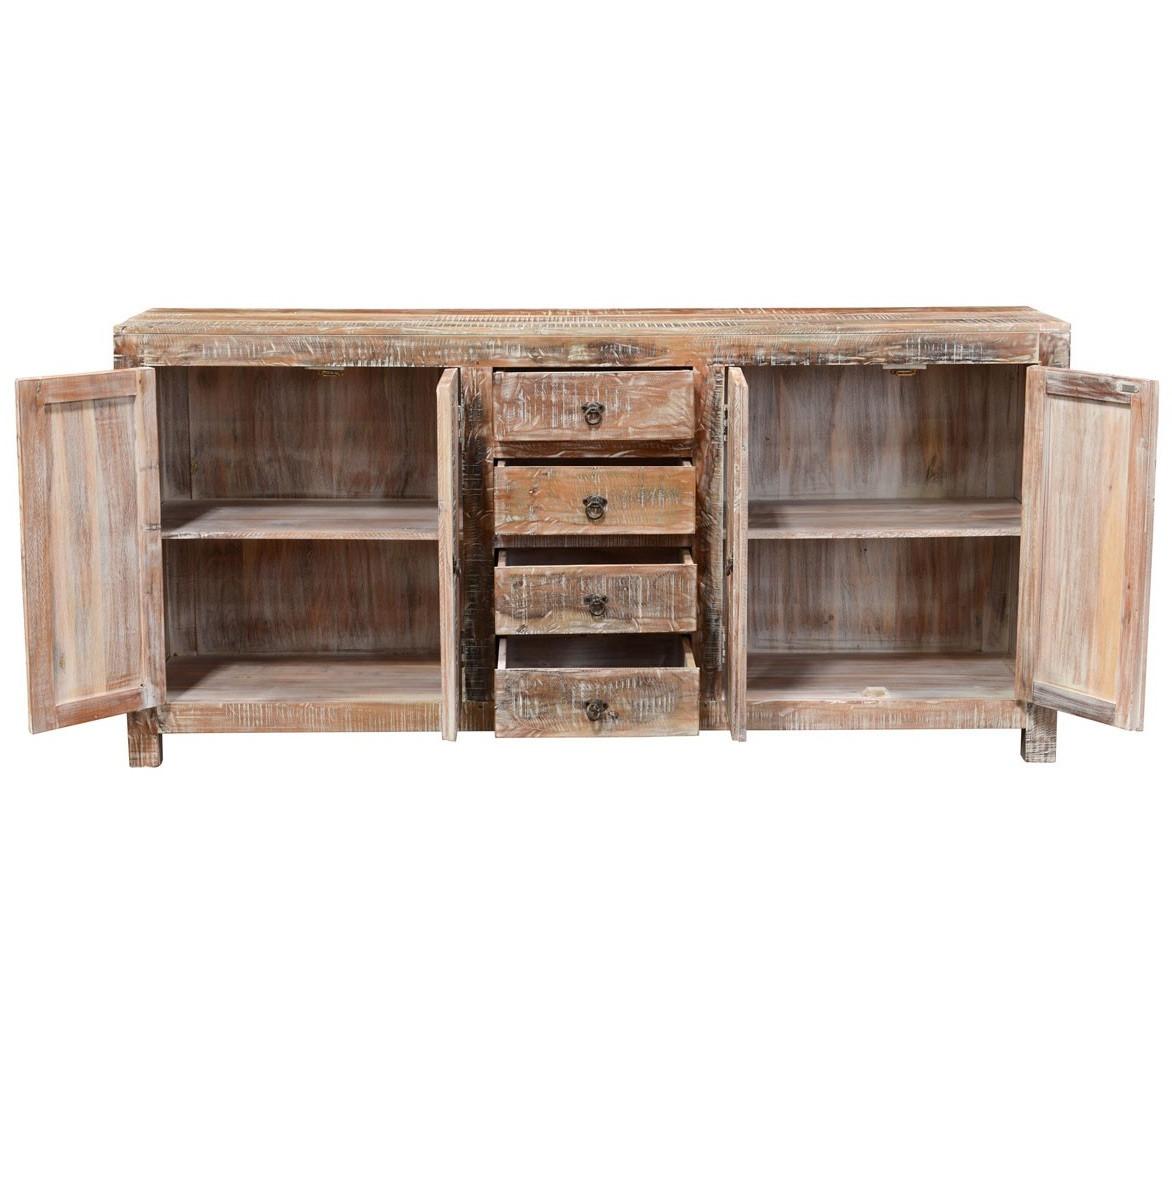 Teak Wood Buffet ~ Hampton rustic teak wood buffet sideboard zin home